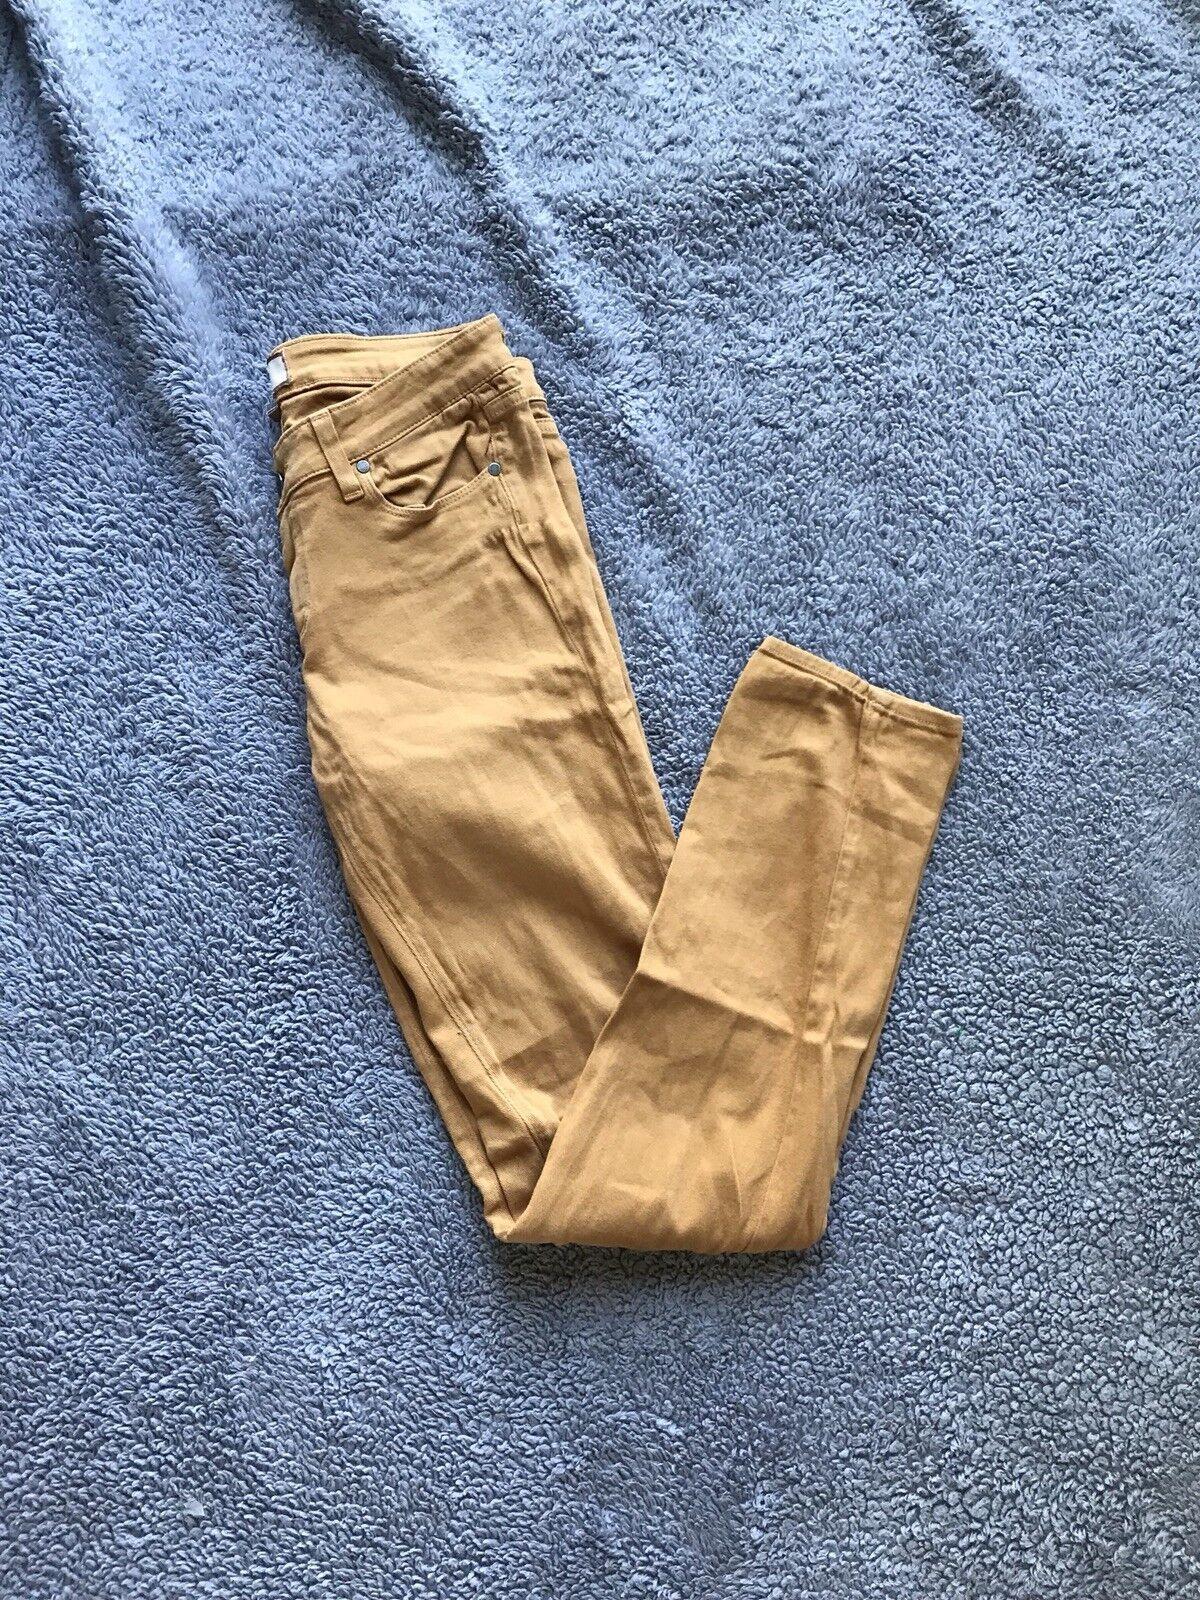 Women's Vintage Paige Denim Camel Tan 98% Cotton Peg Skinny Stretchy Pants 27